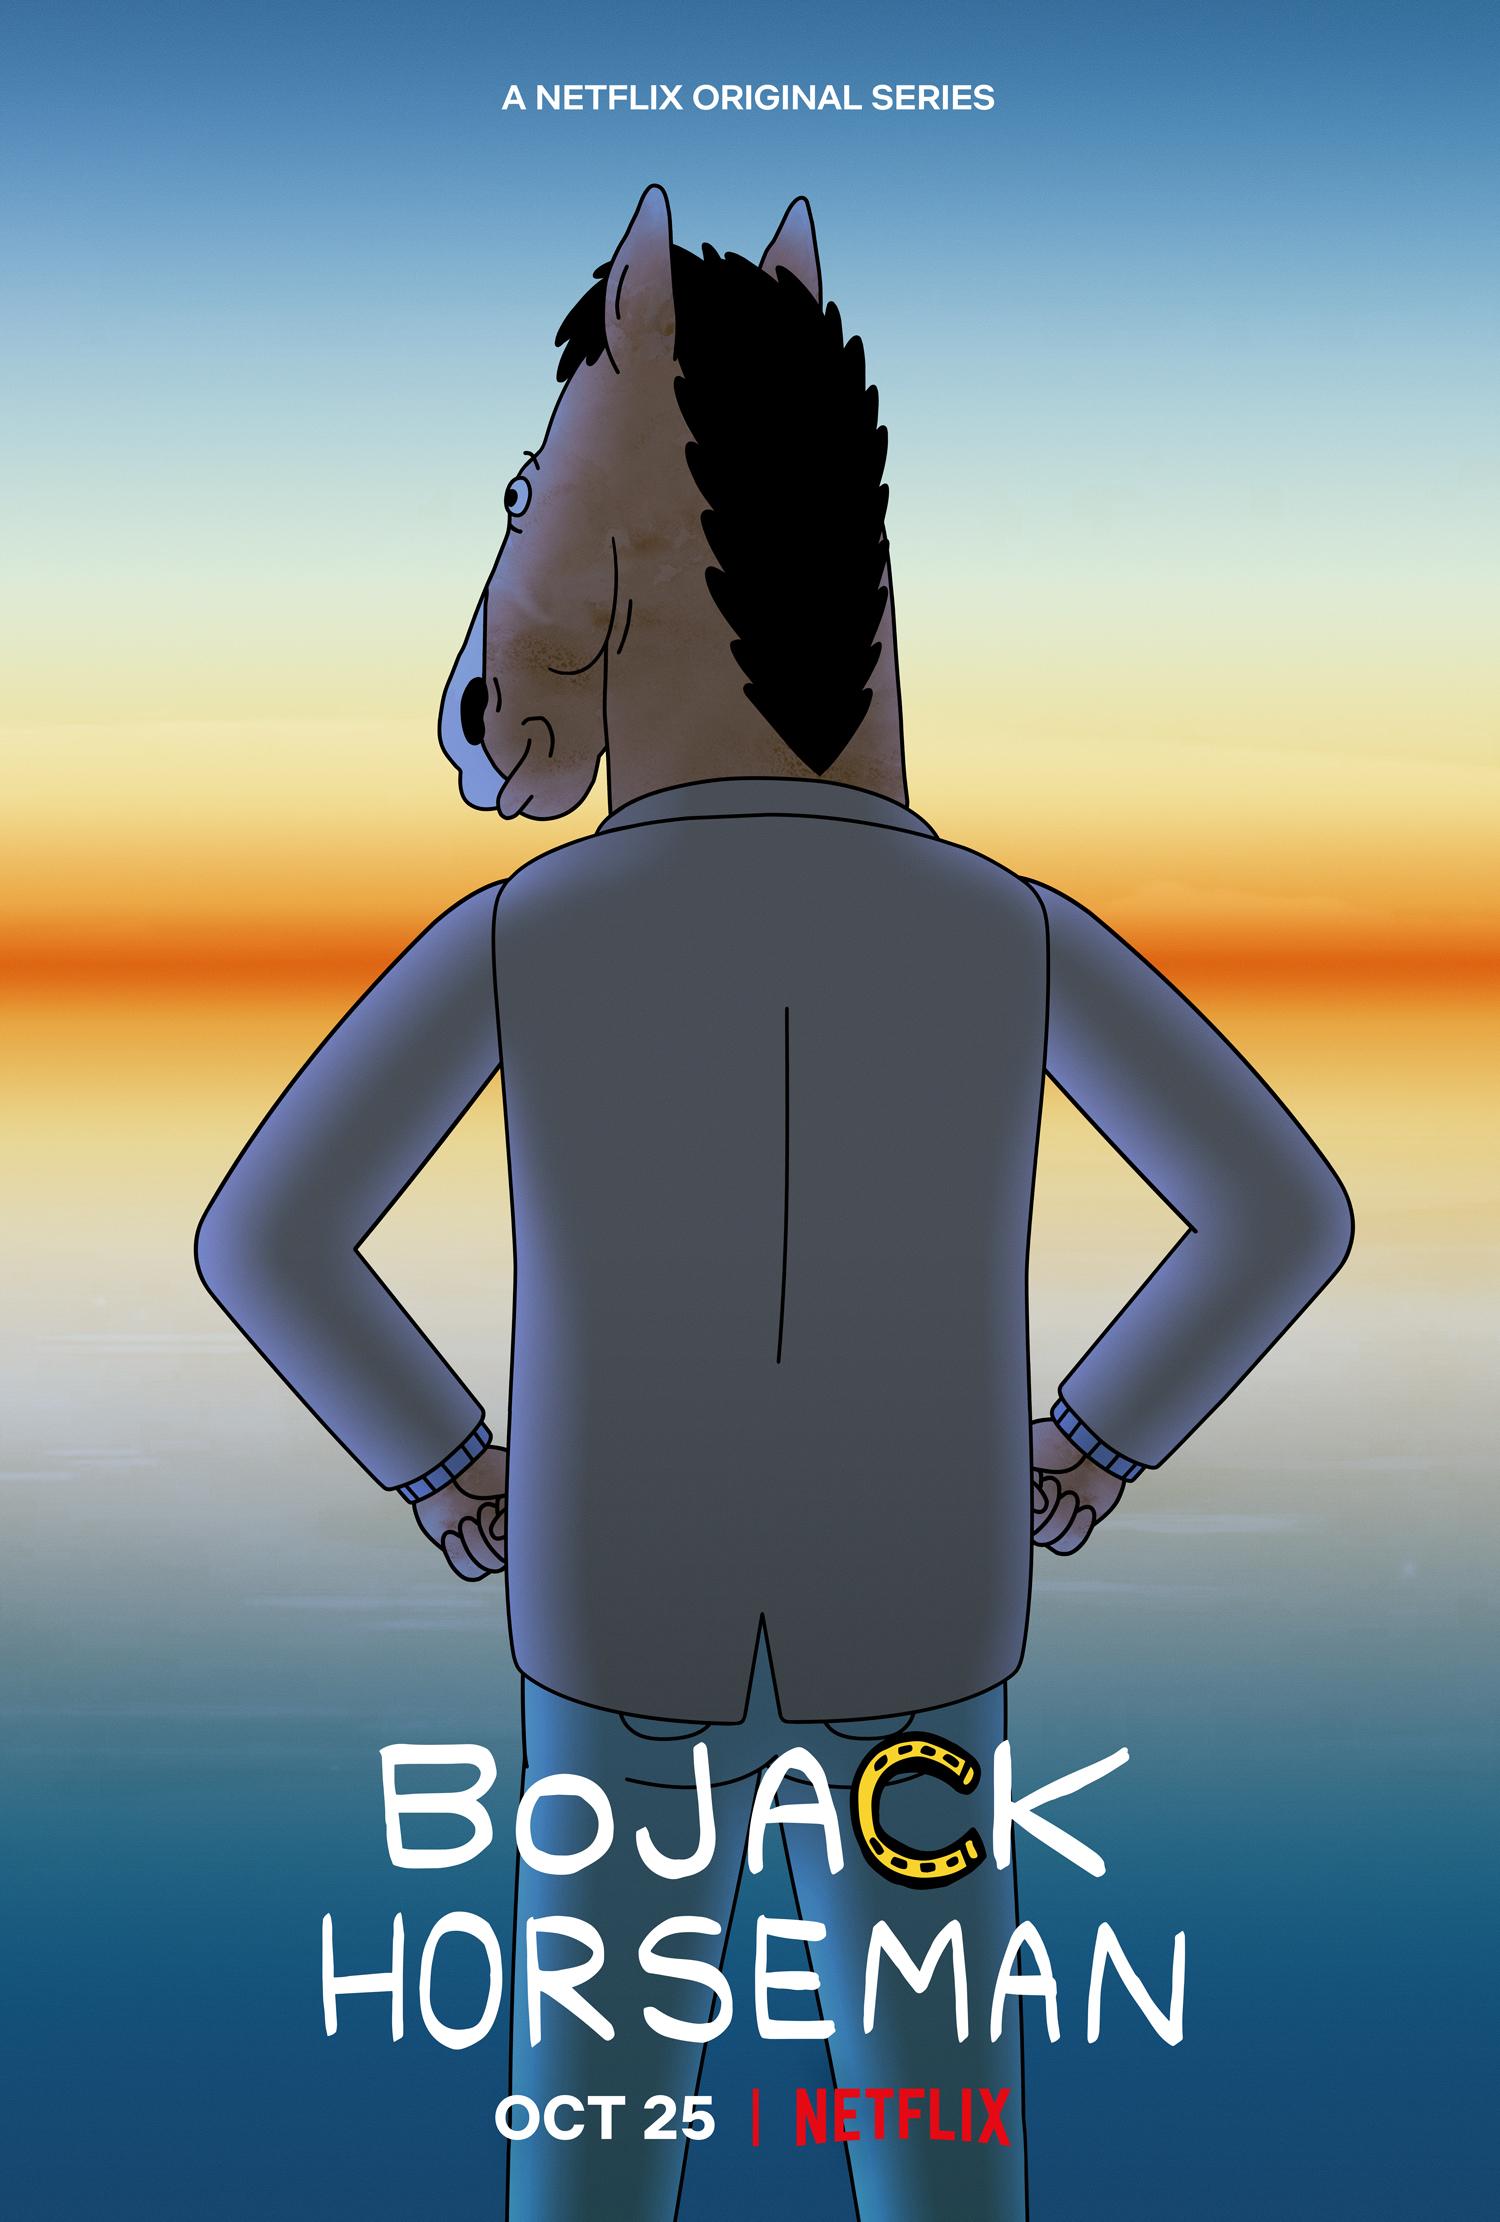 The Sn. 6 Bojack Horseman Officially Netflix Poster.